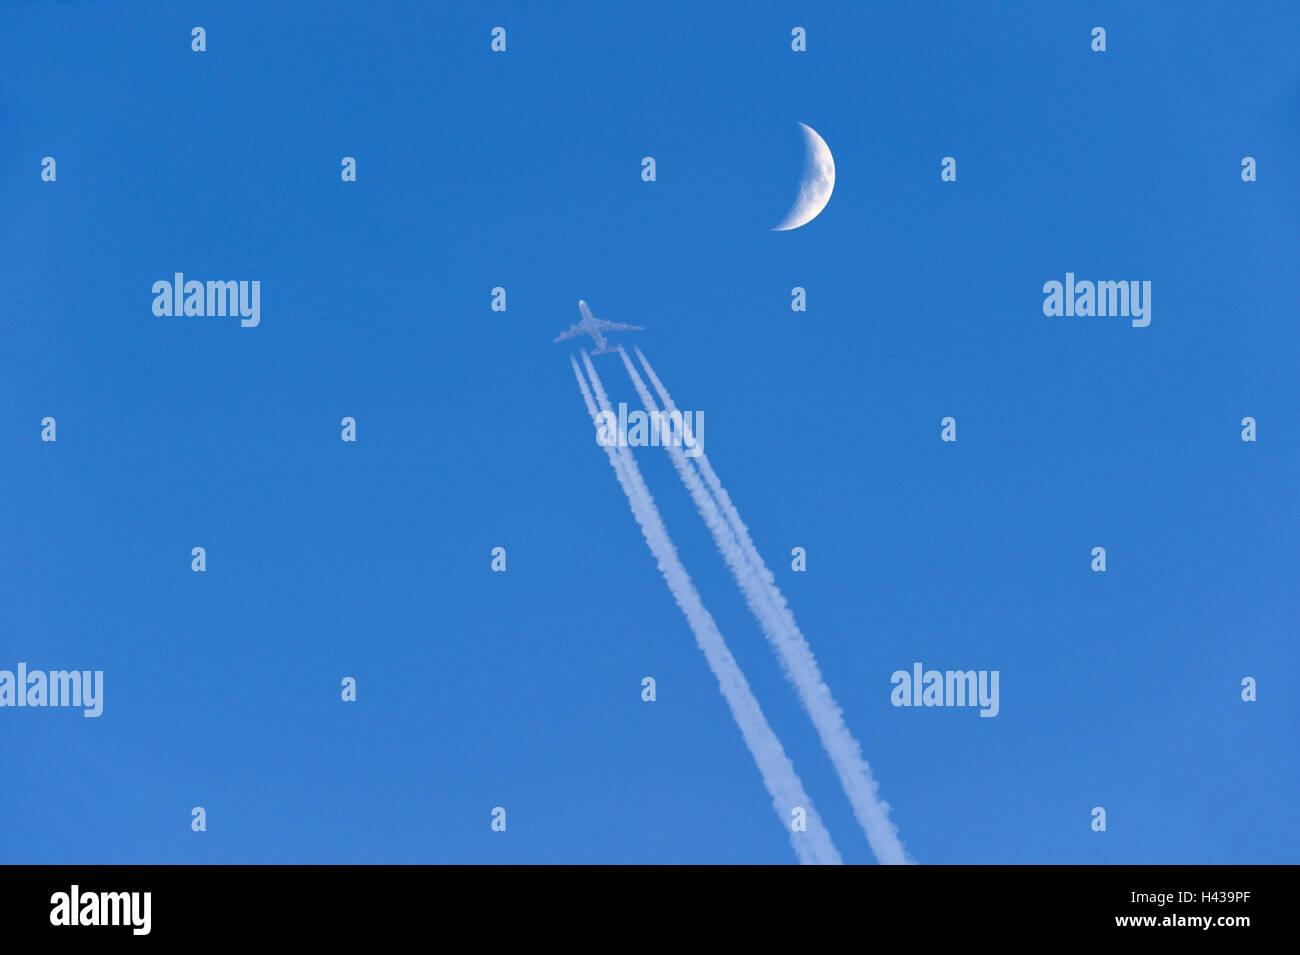 Airplane, condensation trail, moon, heaven, blue, Stock Photo